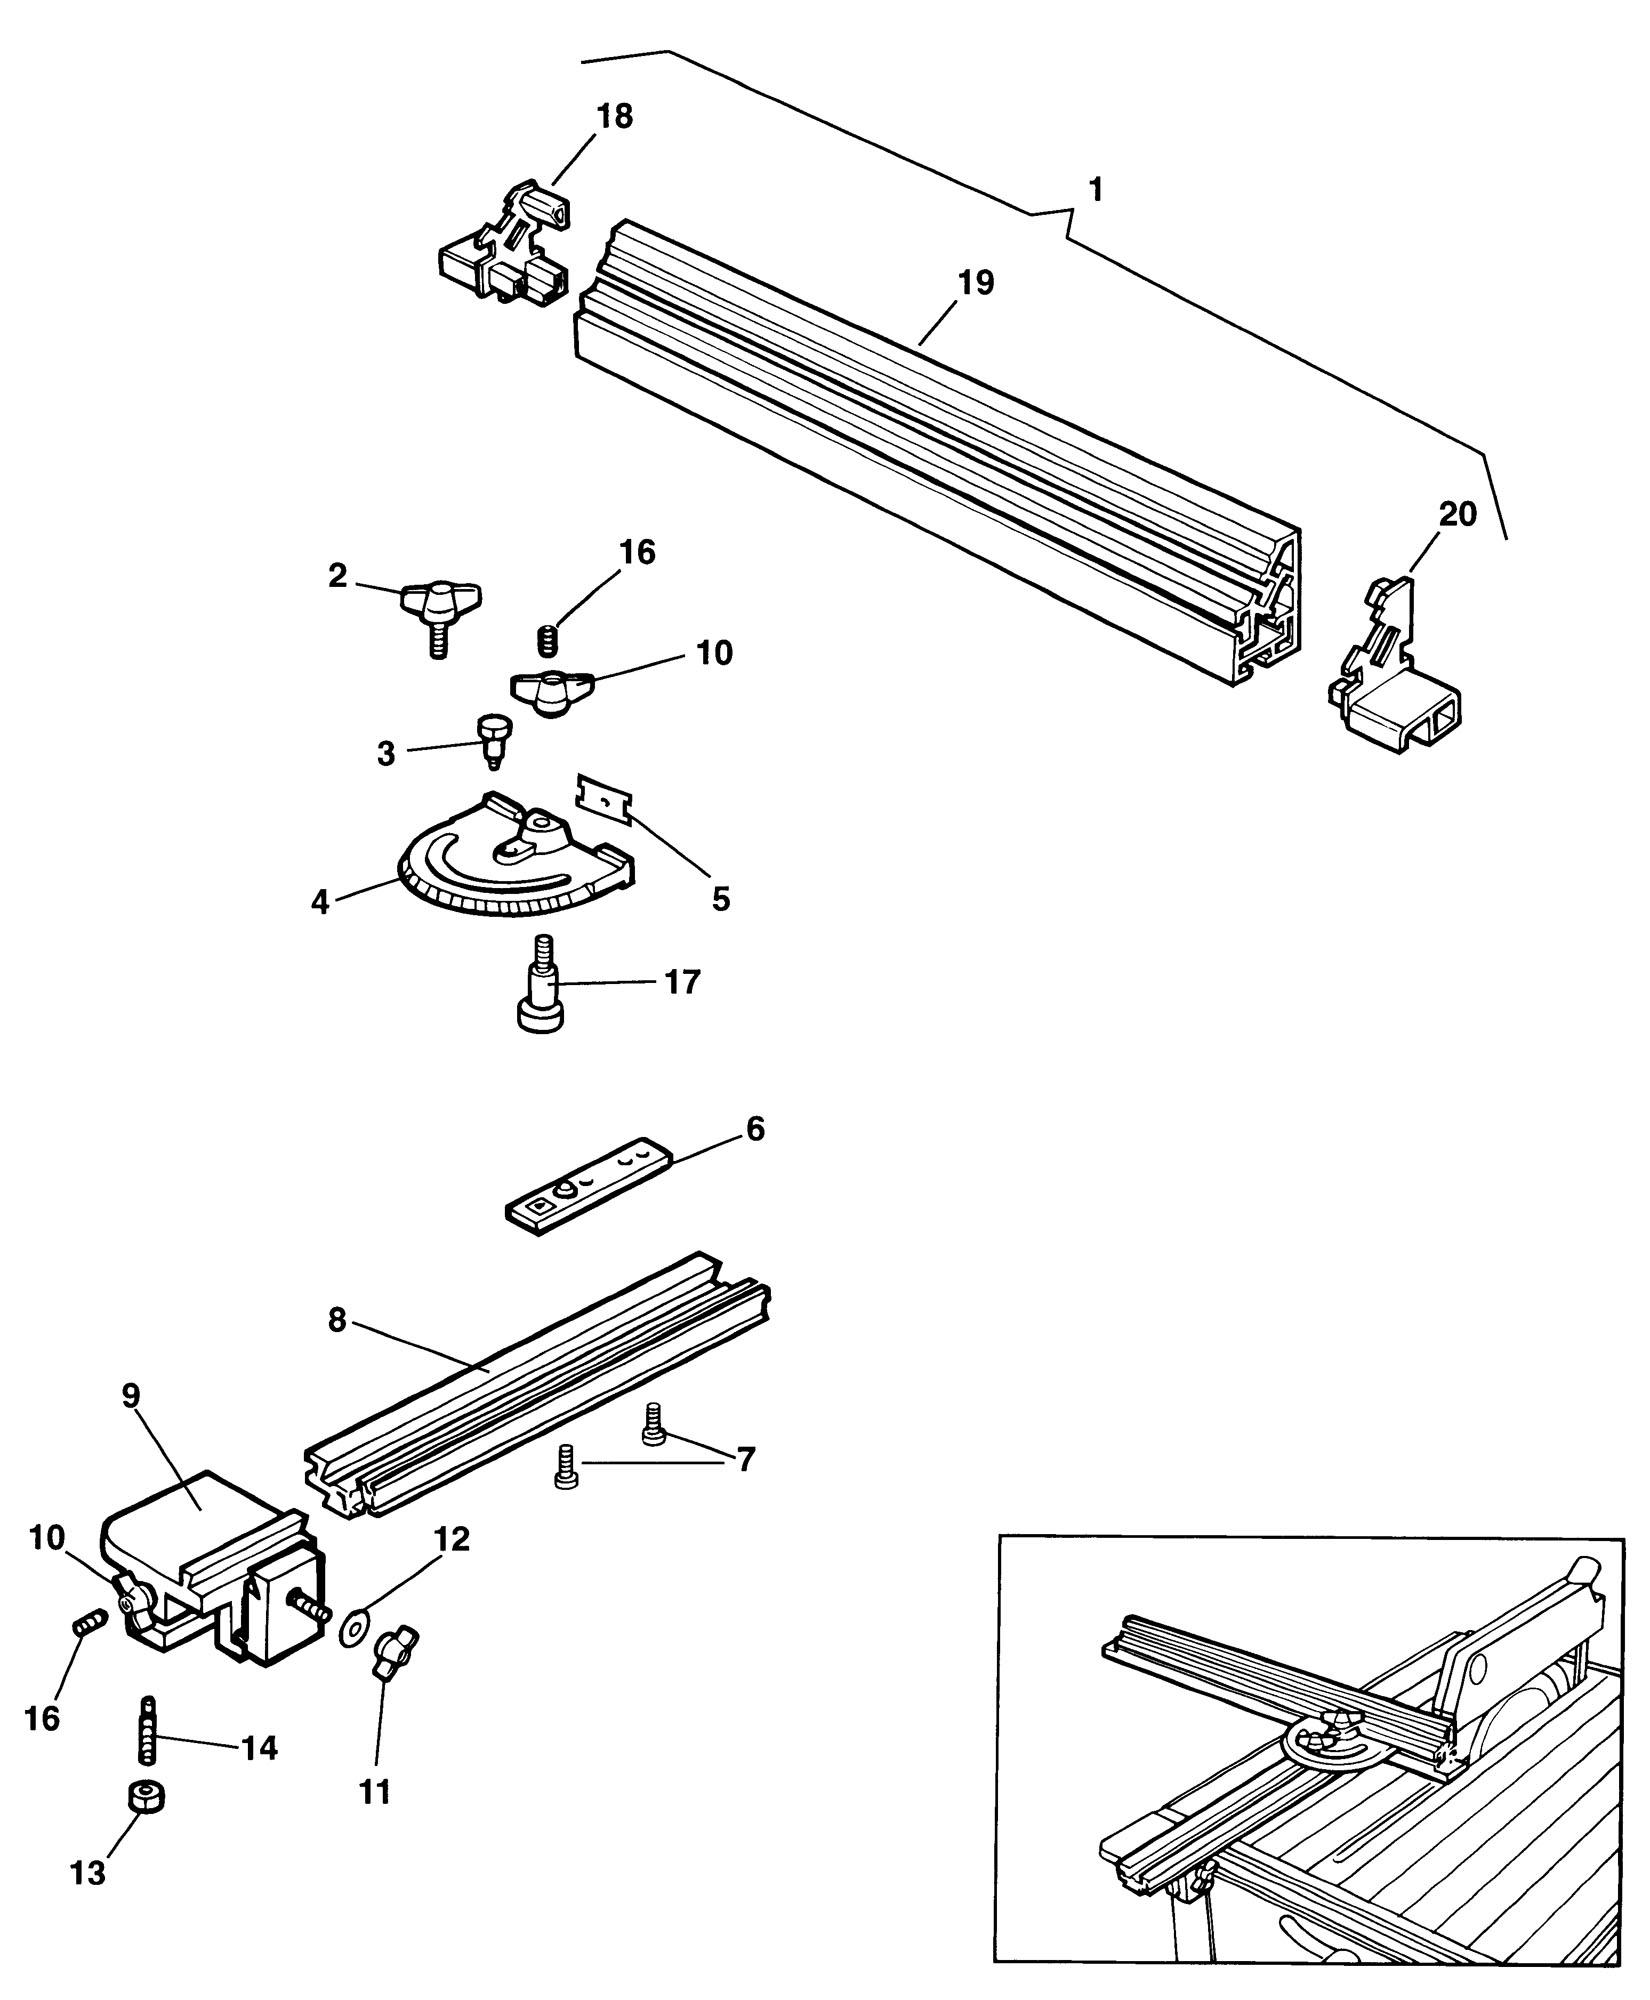 Spares For Elu Ezets10 Fence Type 1 Spare Ezets10 Type 1